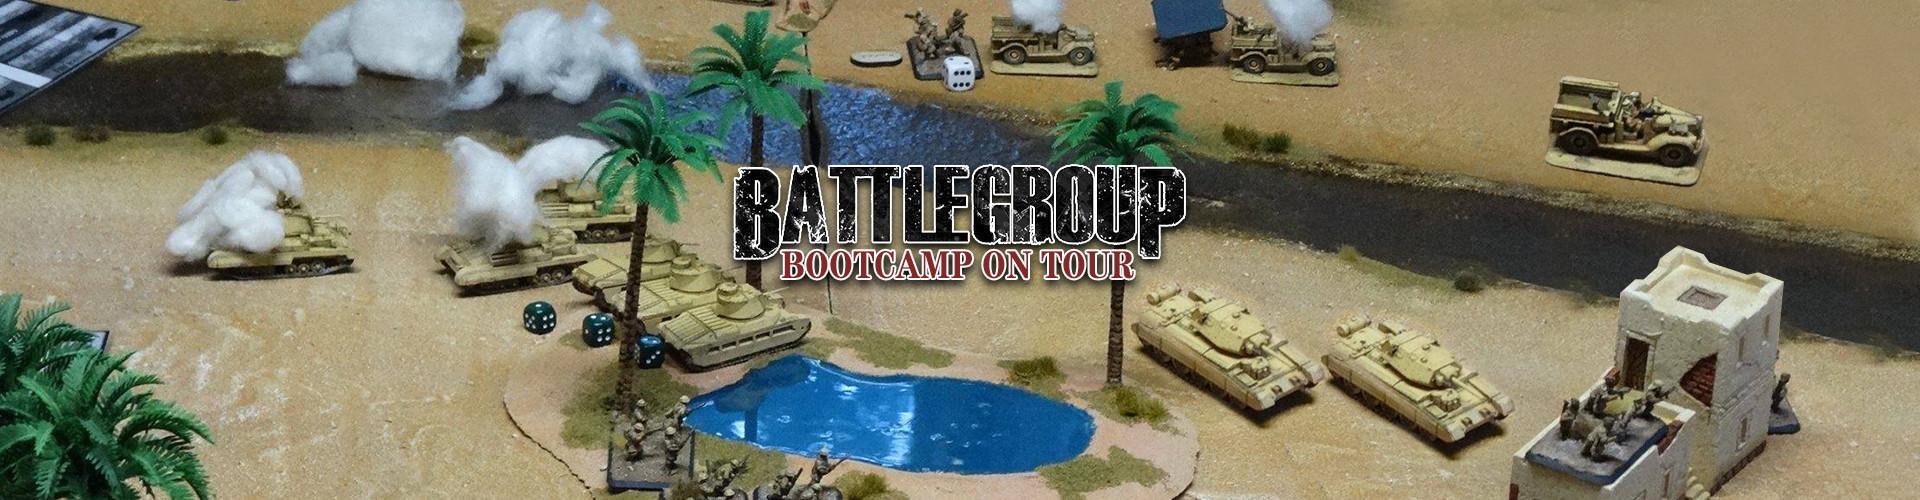 DEMO 03 battlegroup - Demospiele: BATTLEGROUP Tobruk